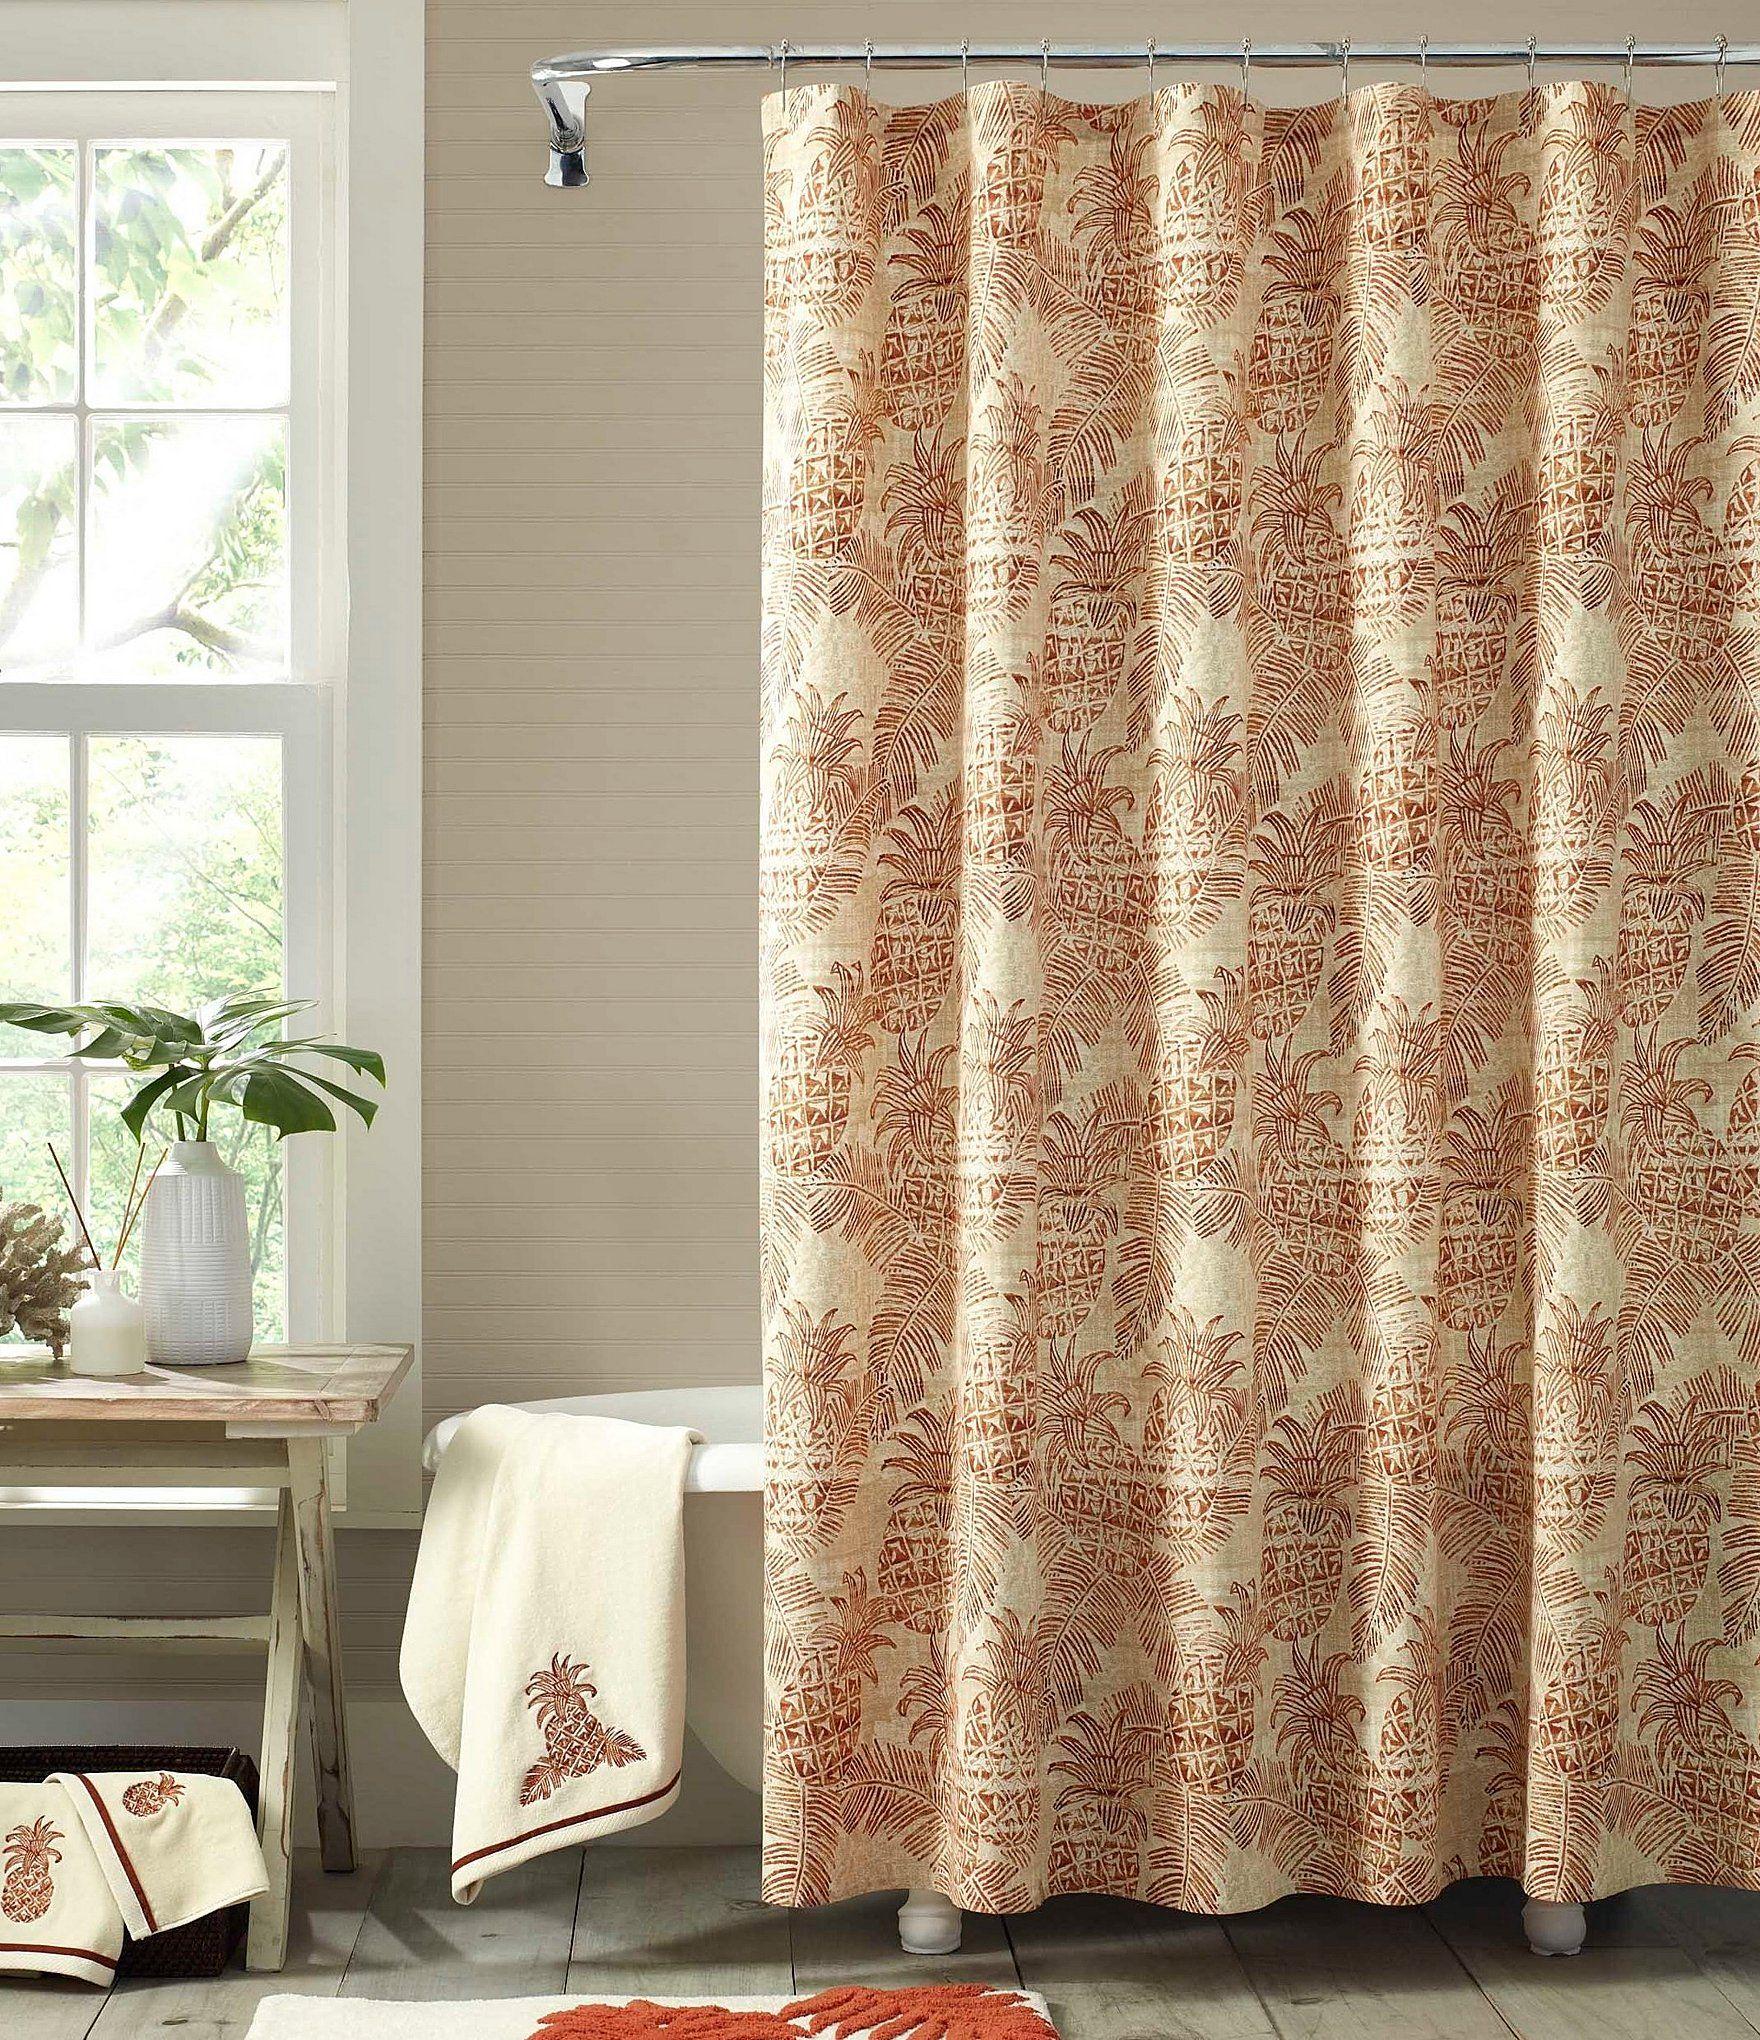 Tommy Bahama Batik Pineapple Shower Curtain In 2020 Pineapple Shower Curtain Tommy Bahama Curtains